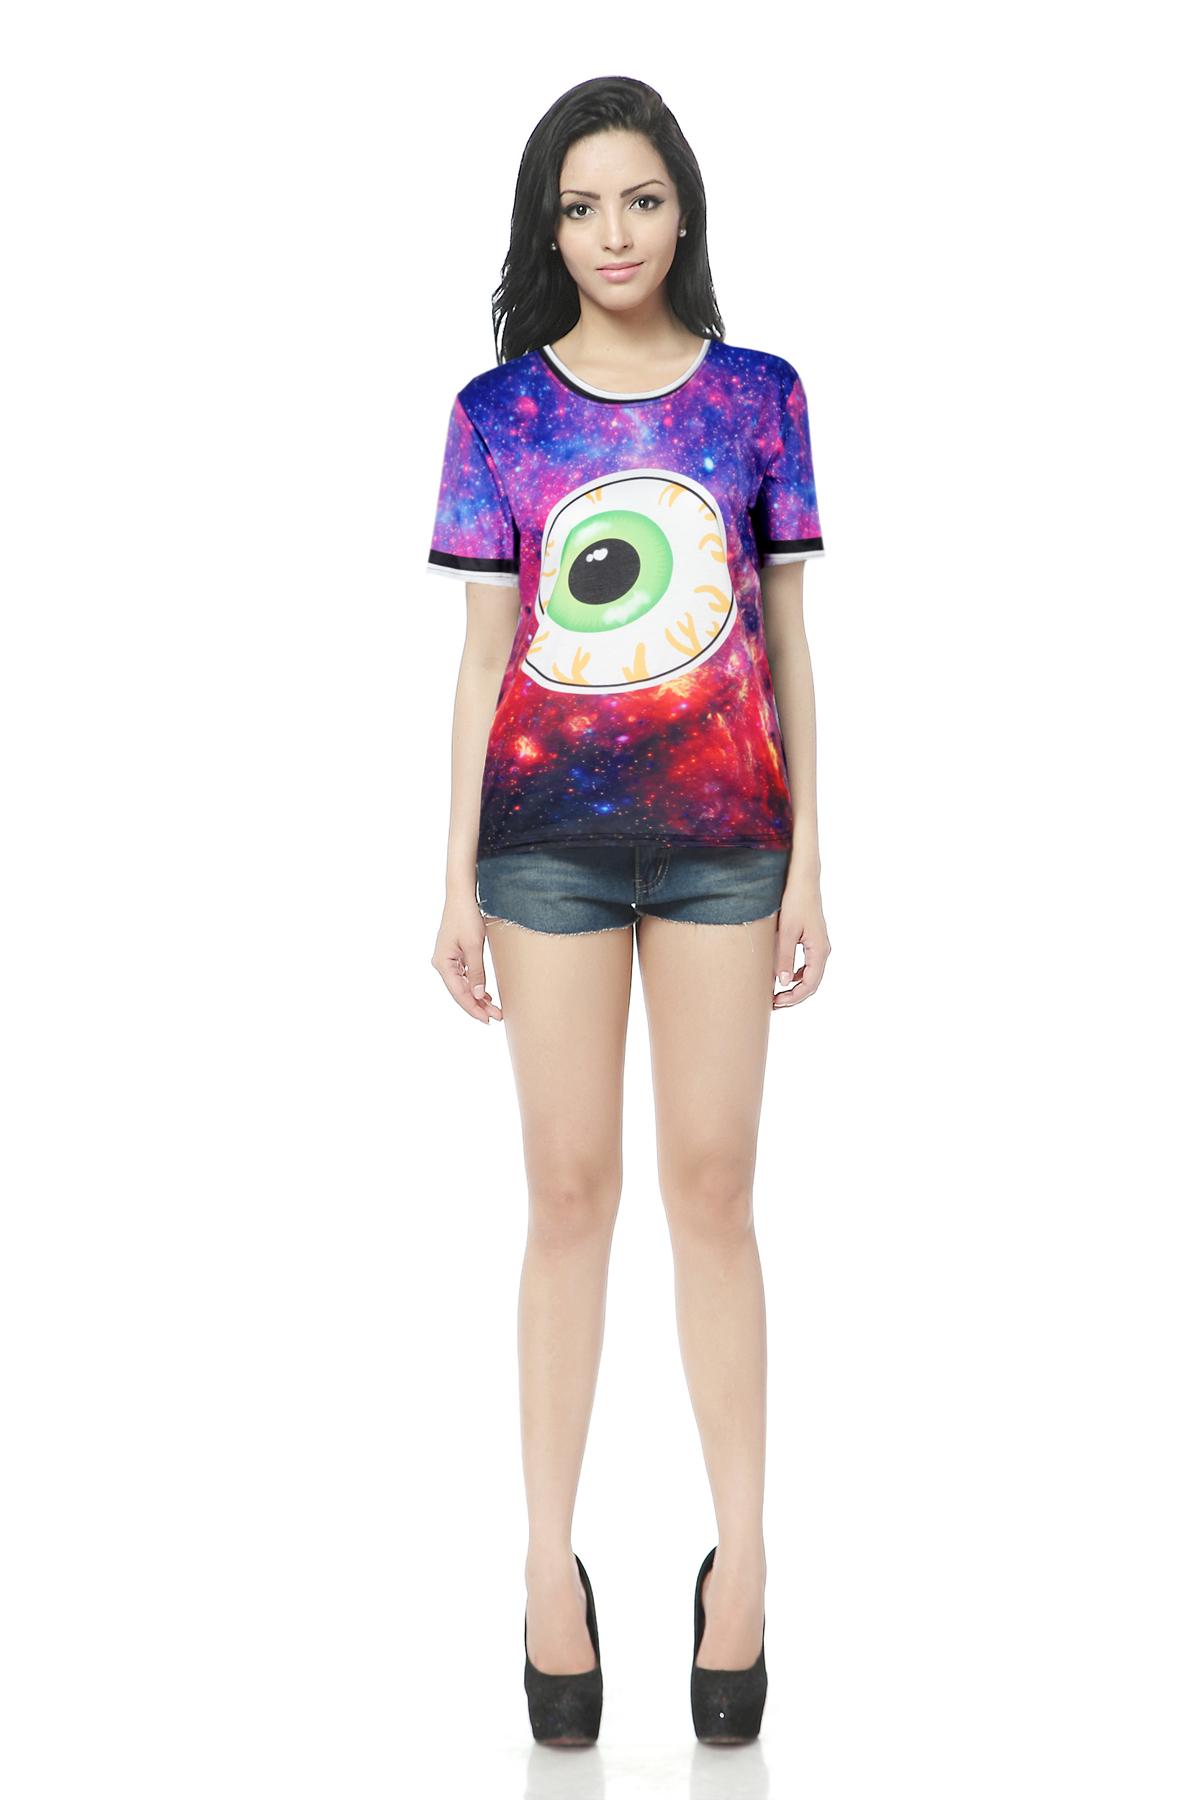 Sublimation print custom printed t shirts no minimum buy for Customized t shirts no minimum order